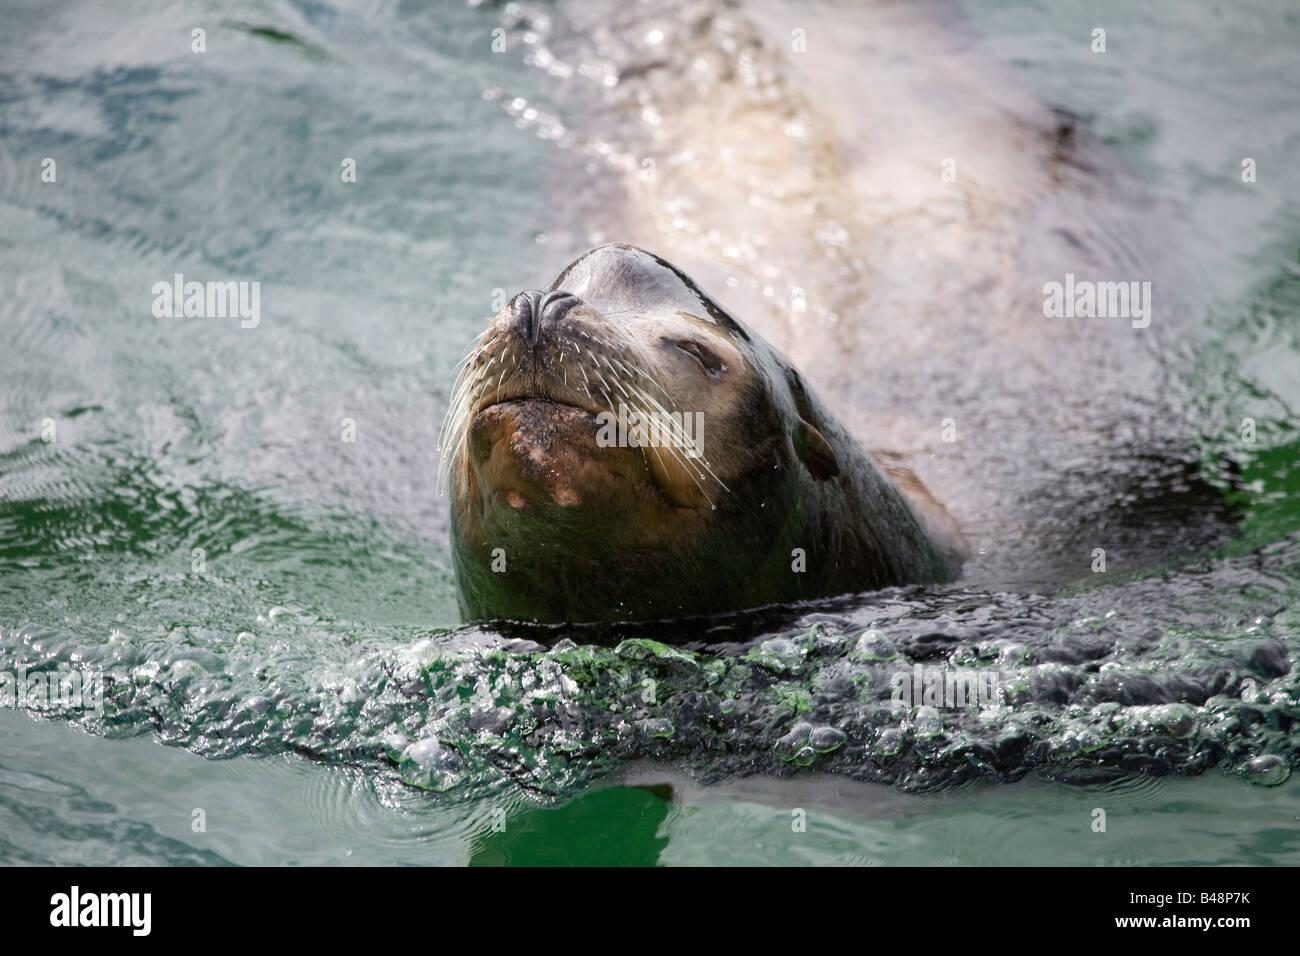 californian sea lion rocky Zalophus californianus rescued at national seal sanctuary cornwall - Stock Image